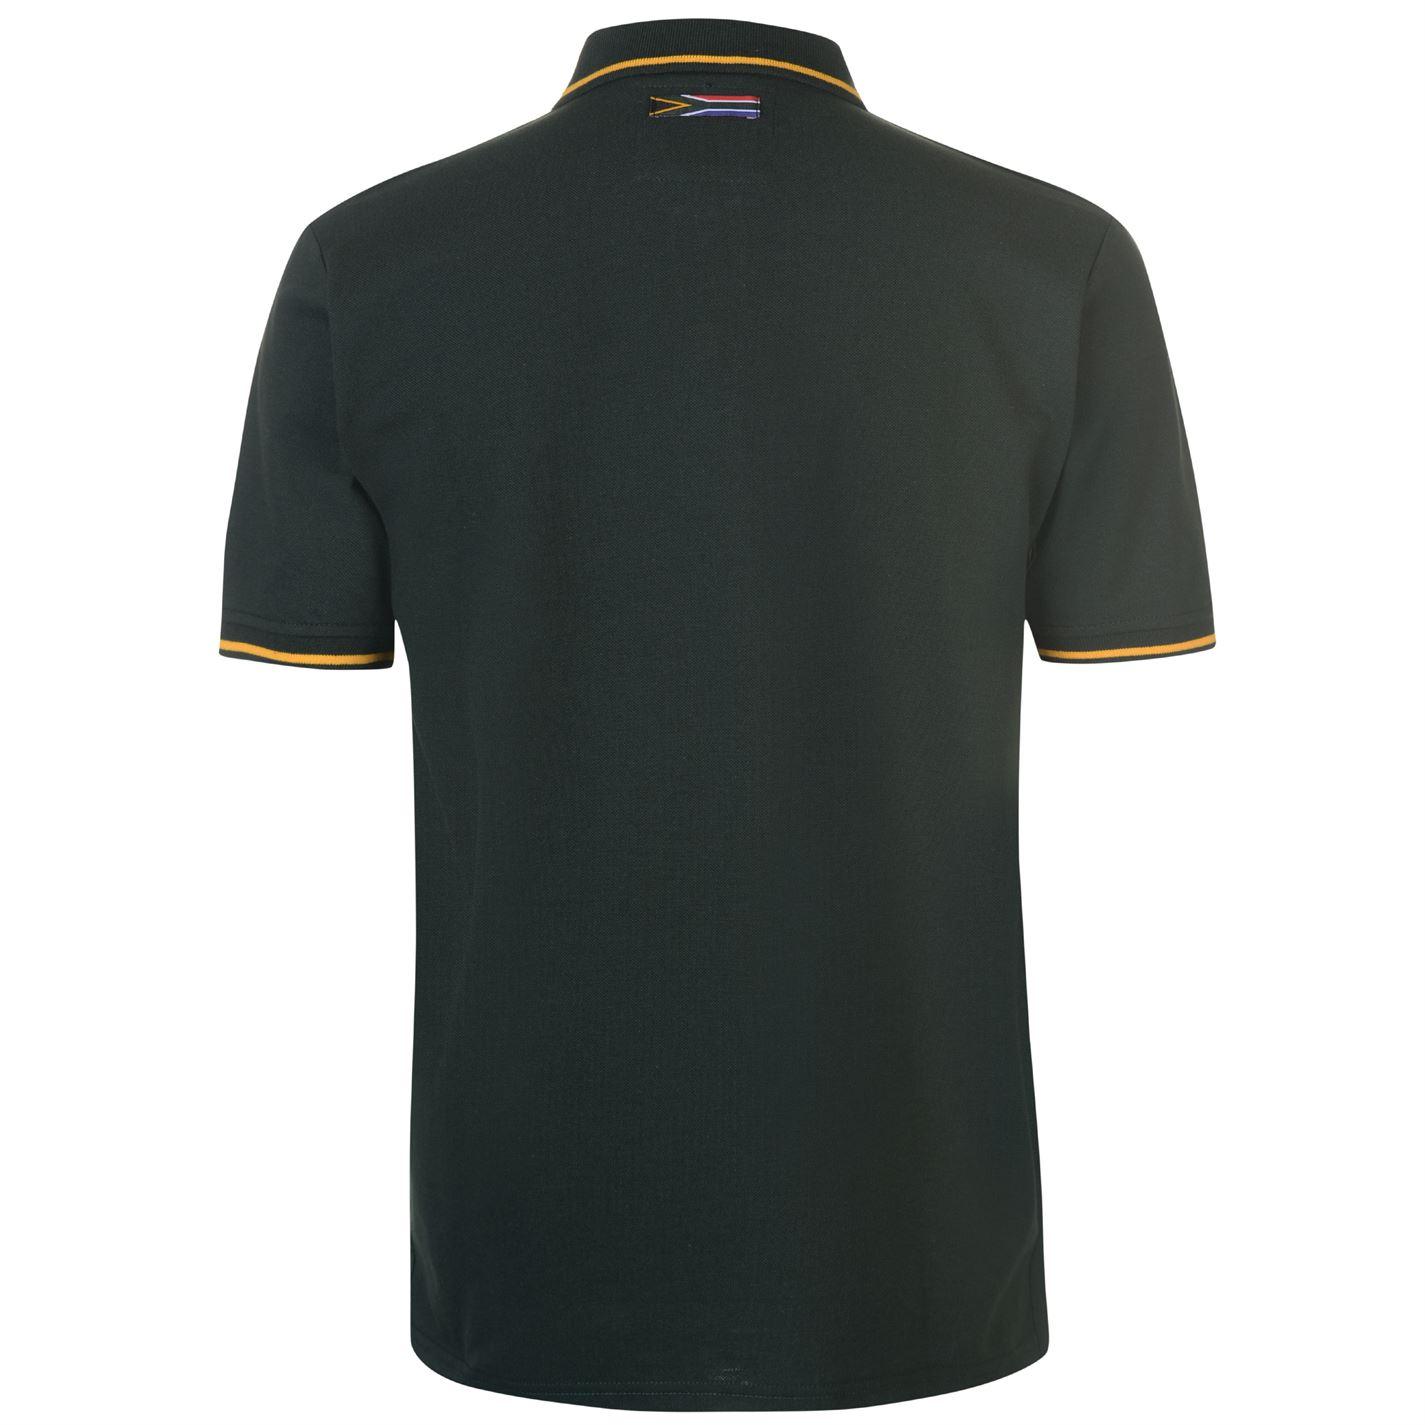 d7d2e4695b6 Team Rugby South Africa Polo Shirt Mens Gents Tee Top Short Sleeve ...